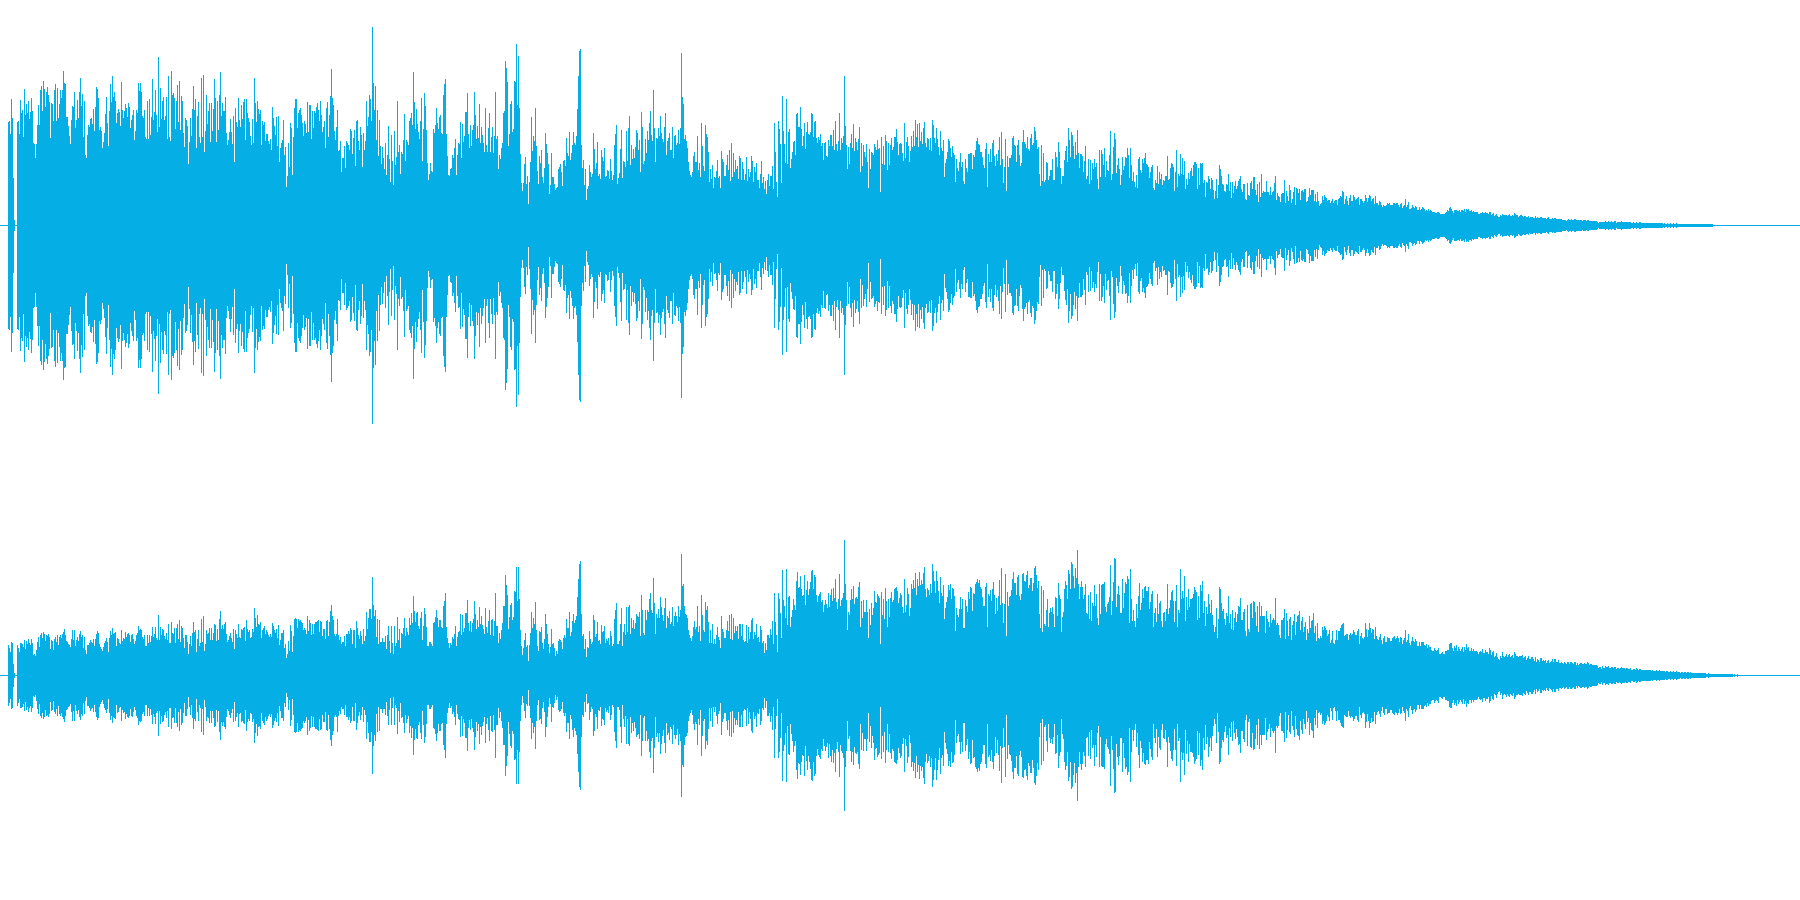 【F1】超ド迫力のF1エンジン効果音4!の再生済みの波形